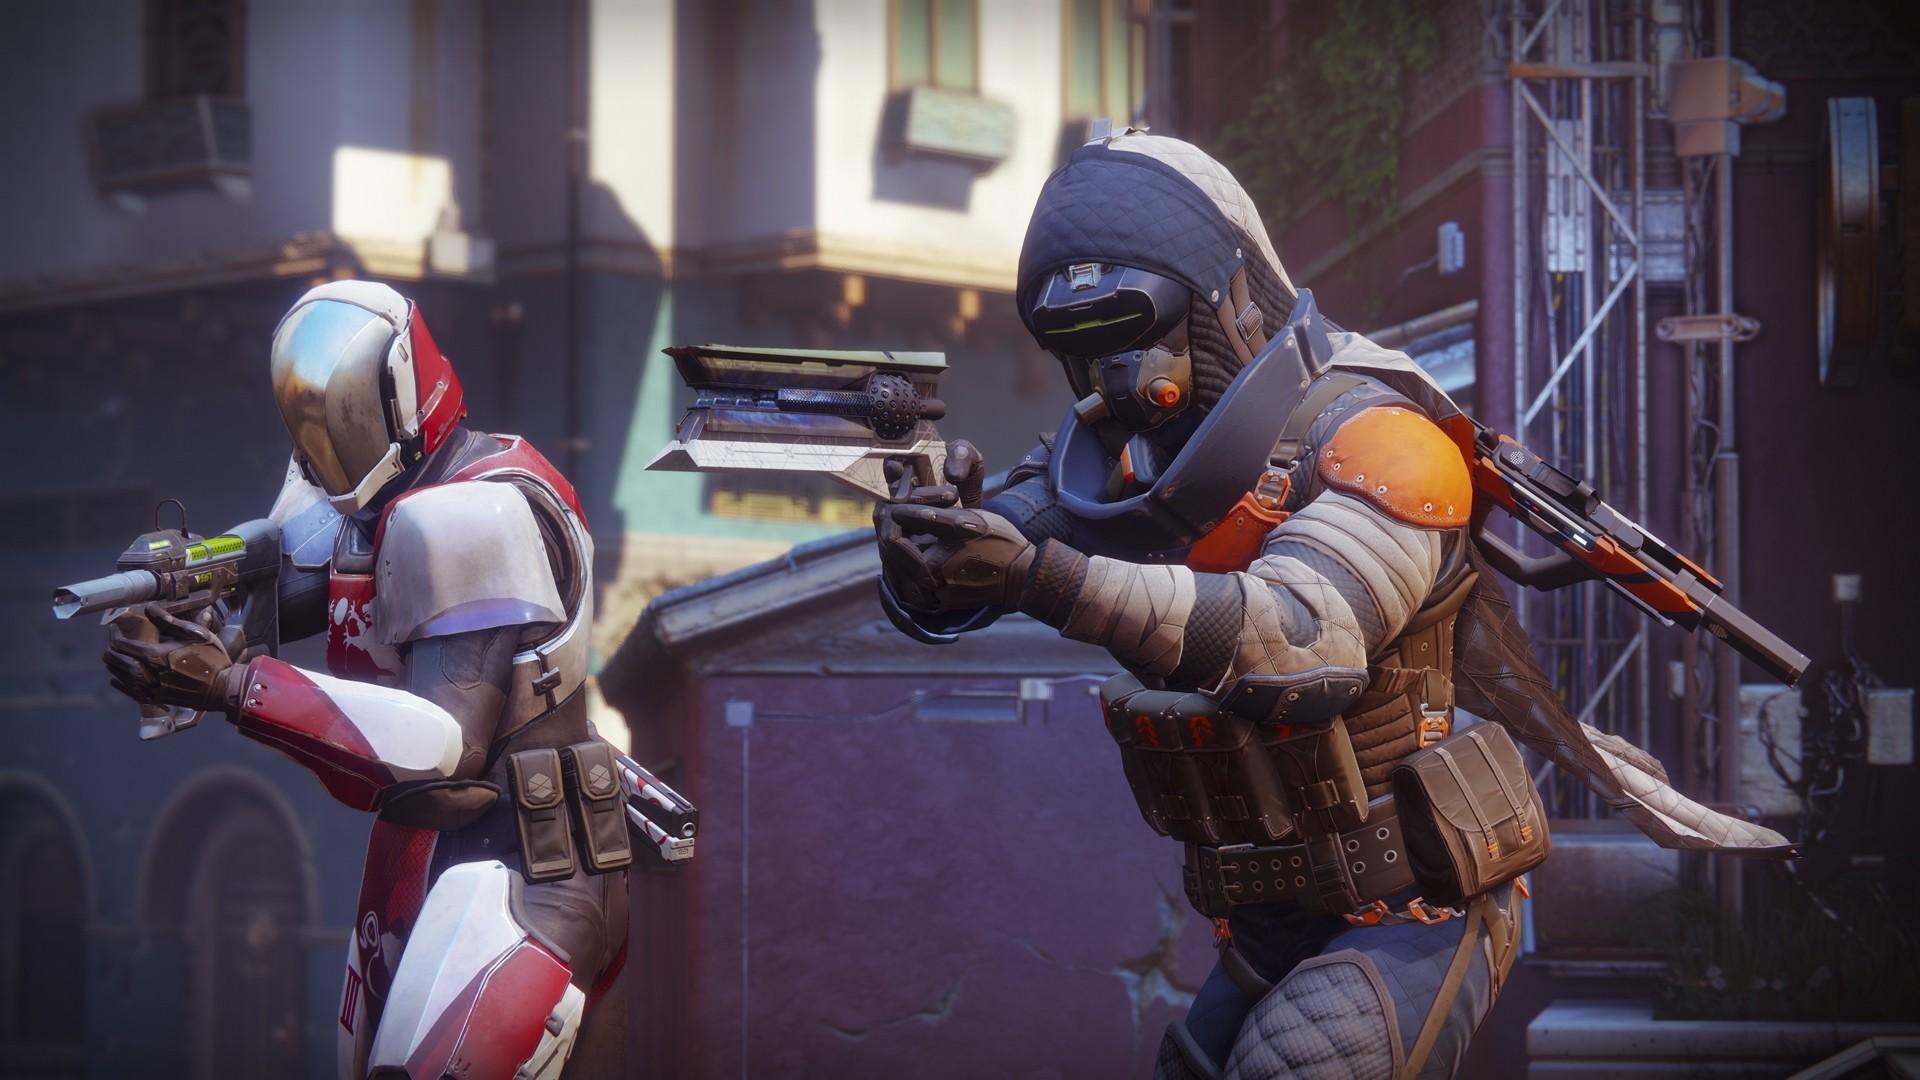 Nice Destiny 2 Hunter and Titan Guardians wallpaper